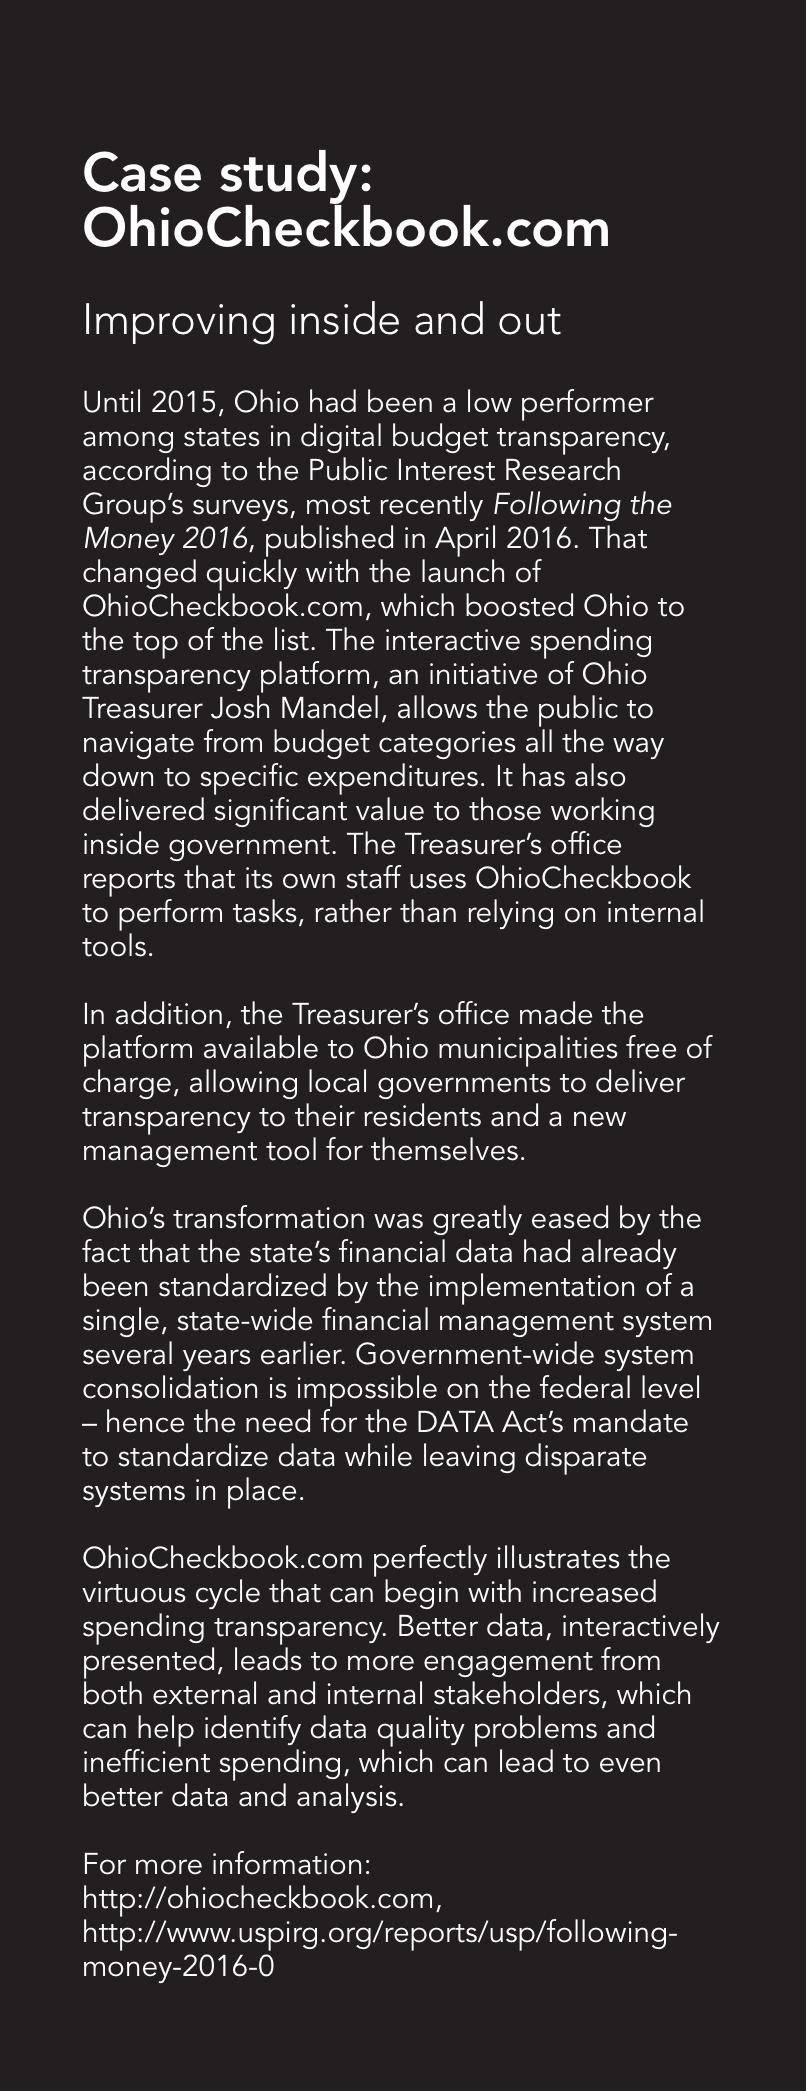 Case study: OhioCheckbook.com